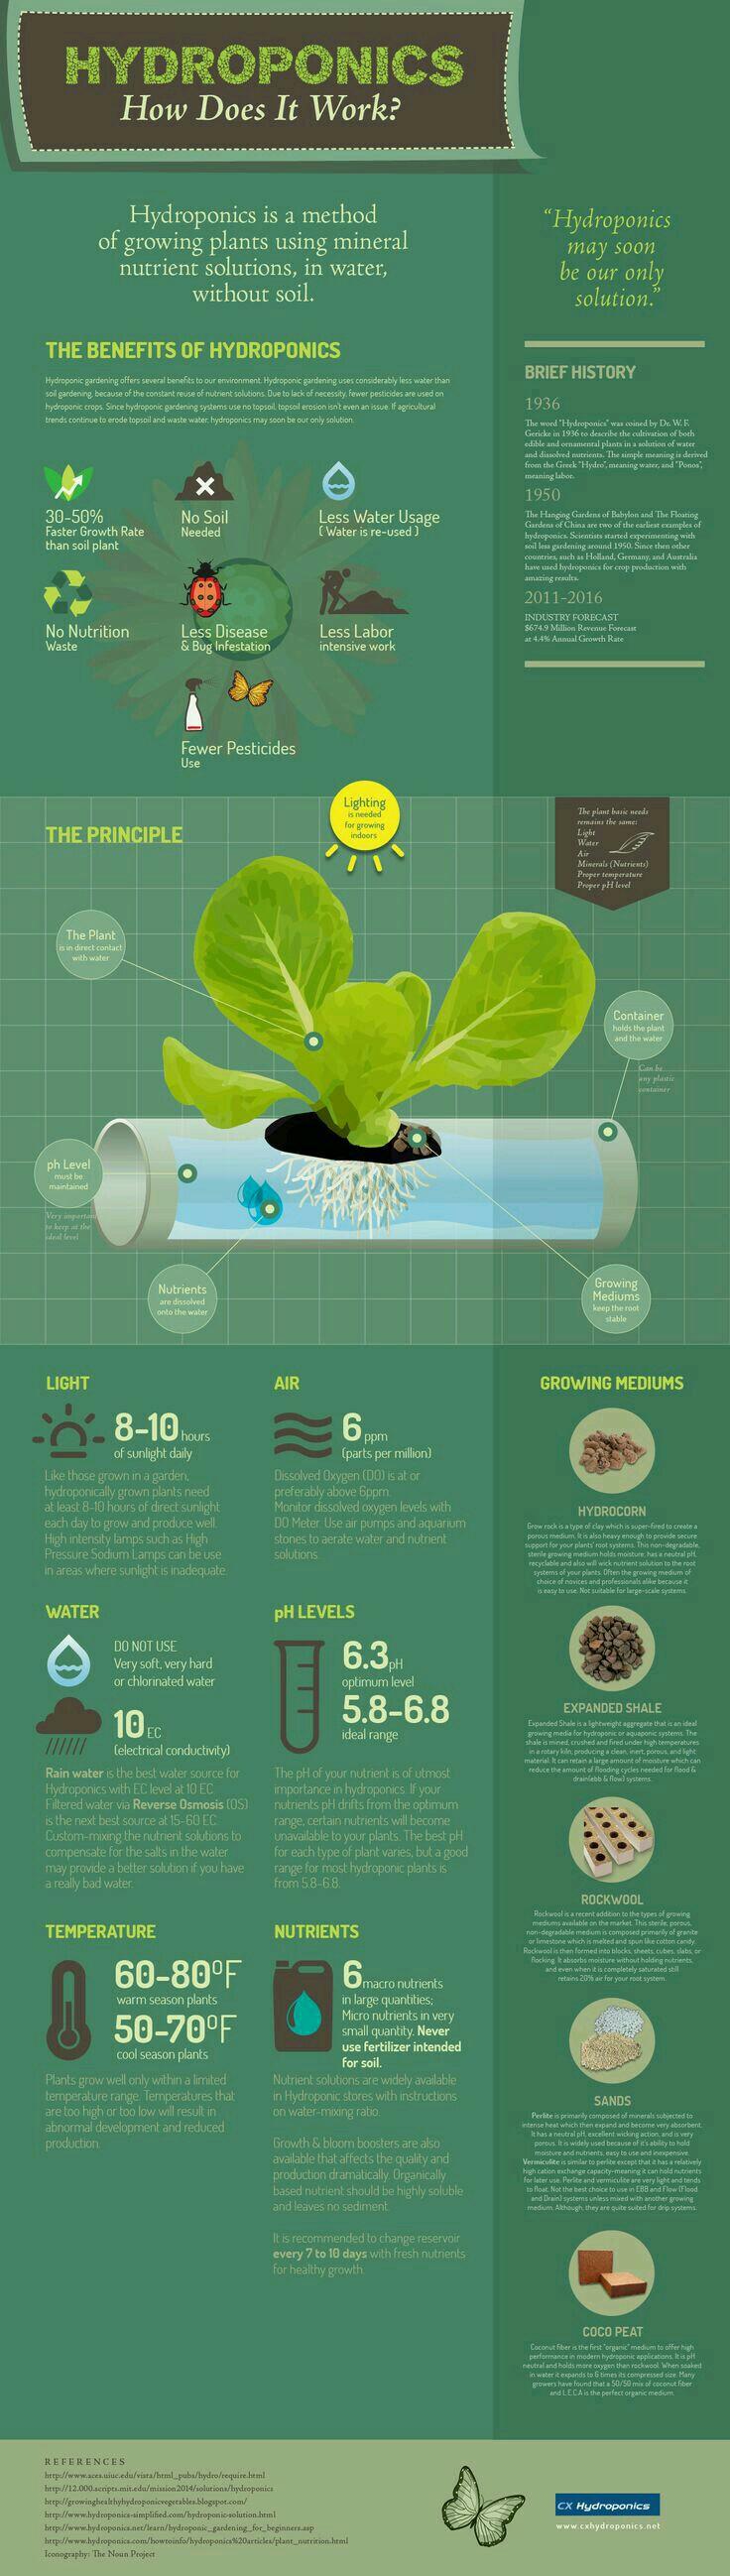 Pin by dakota worrell on urban farming pinterest hydroponics